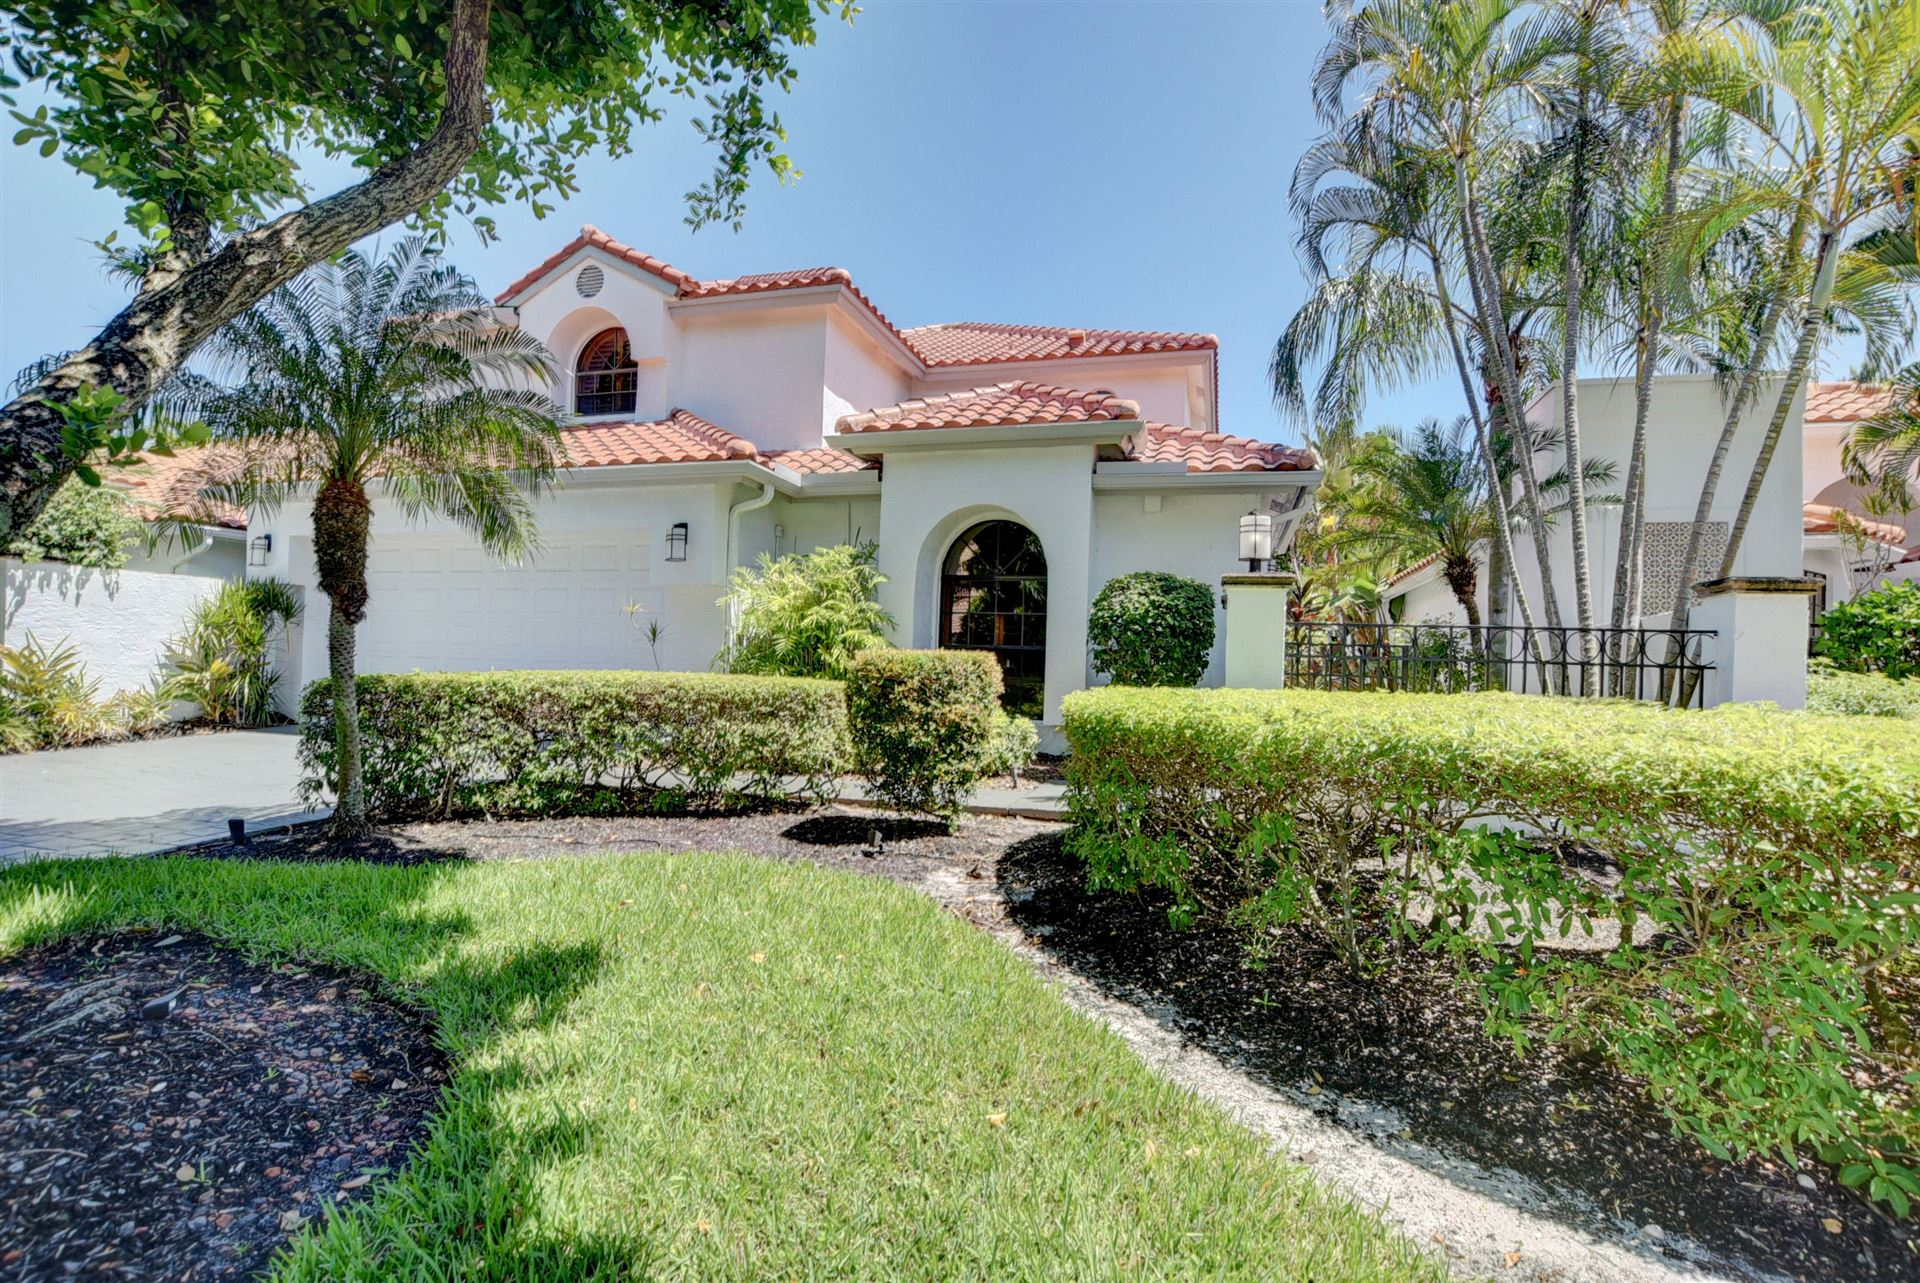 5862 NW 21st Avenue, Boca Raton, FL 33496 - #: RX-10651936